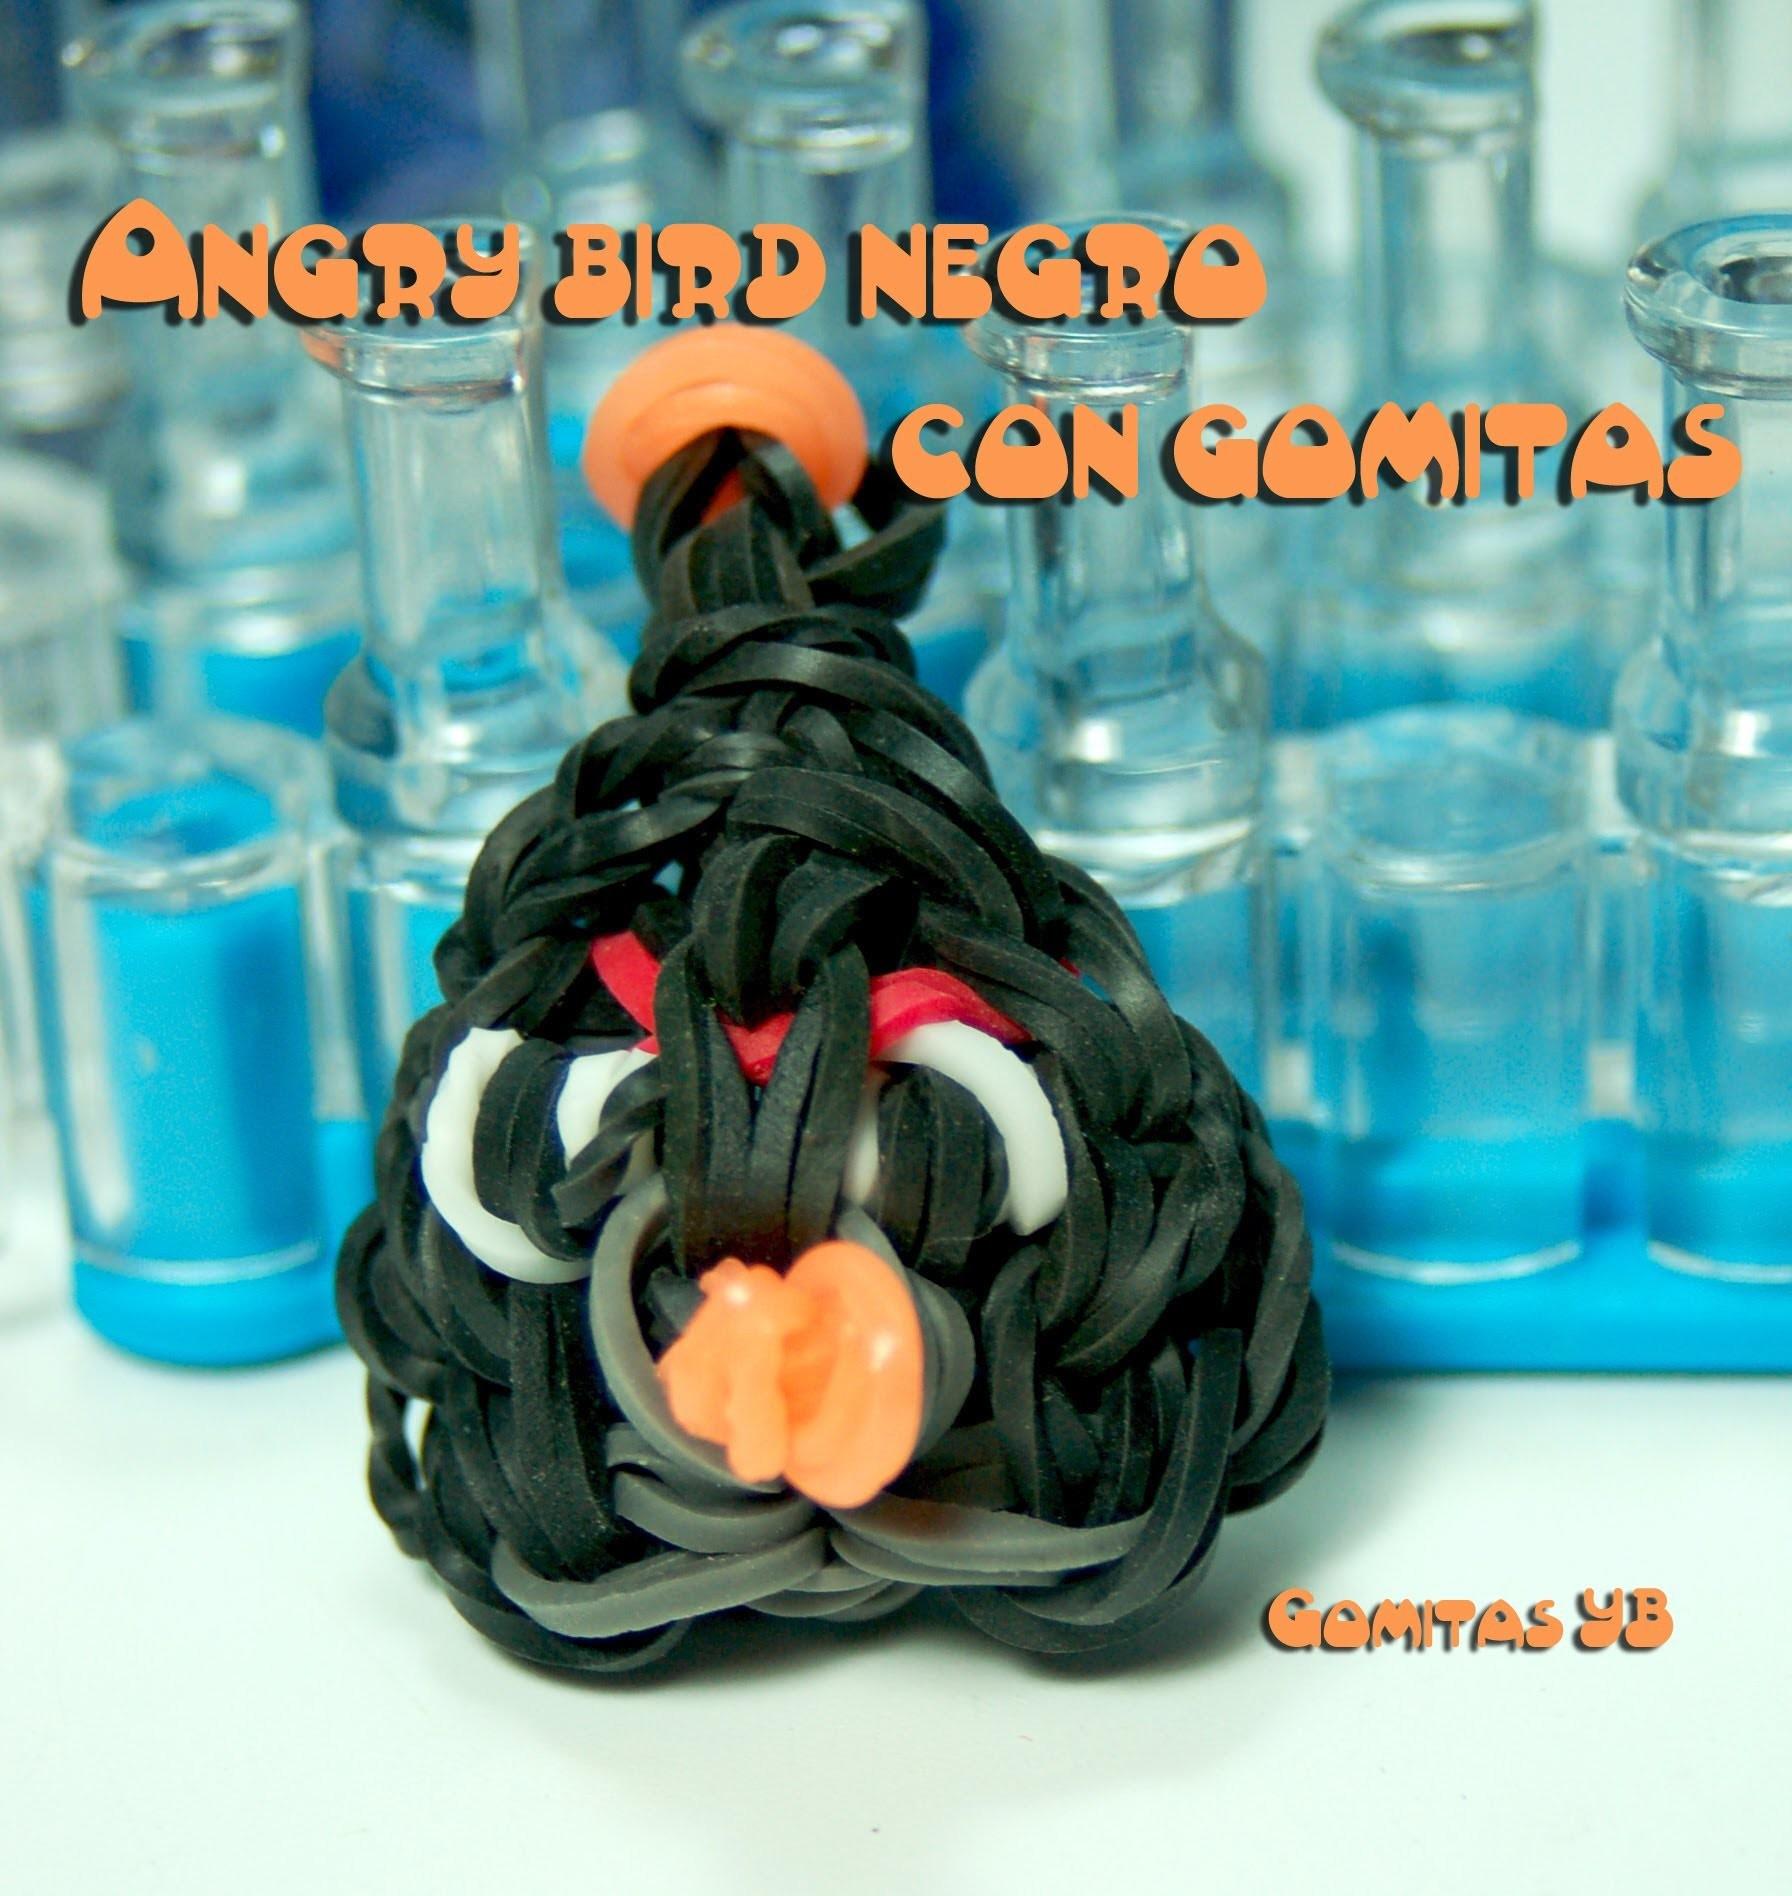 Angry bird negro con gomitas. angry bird black rainbow loom